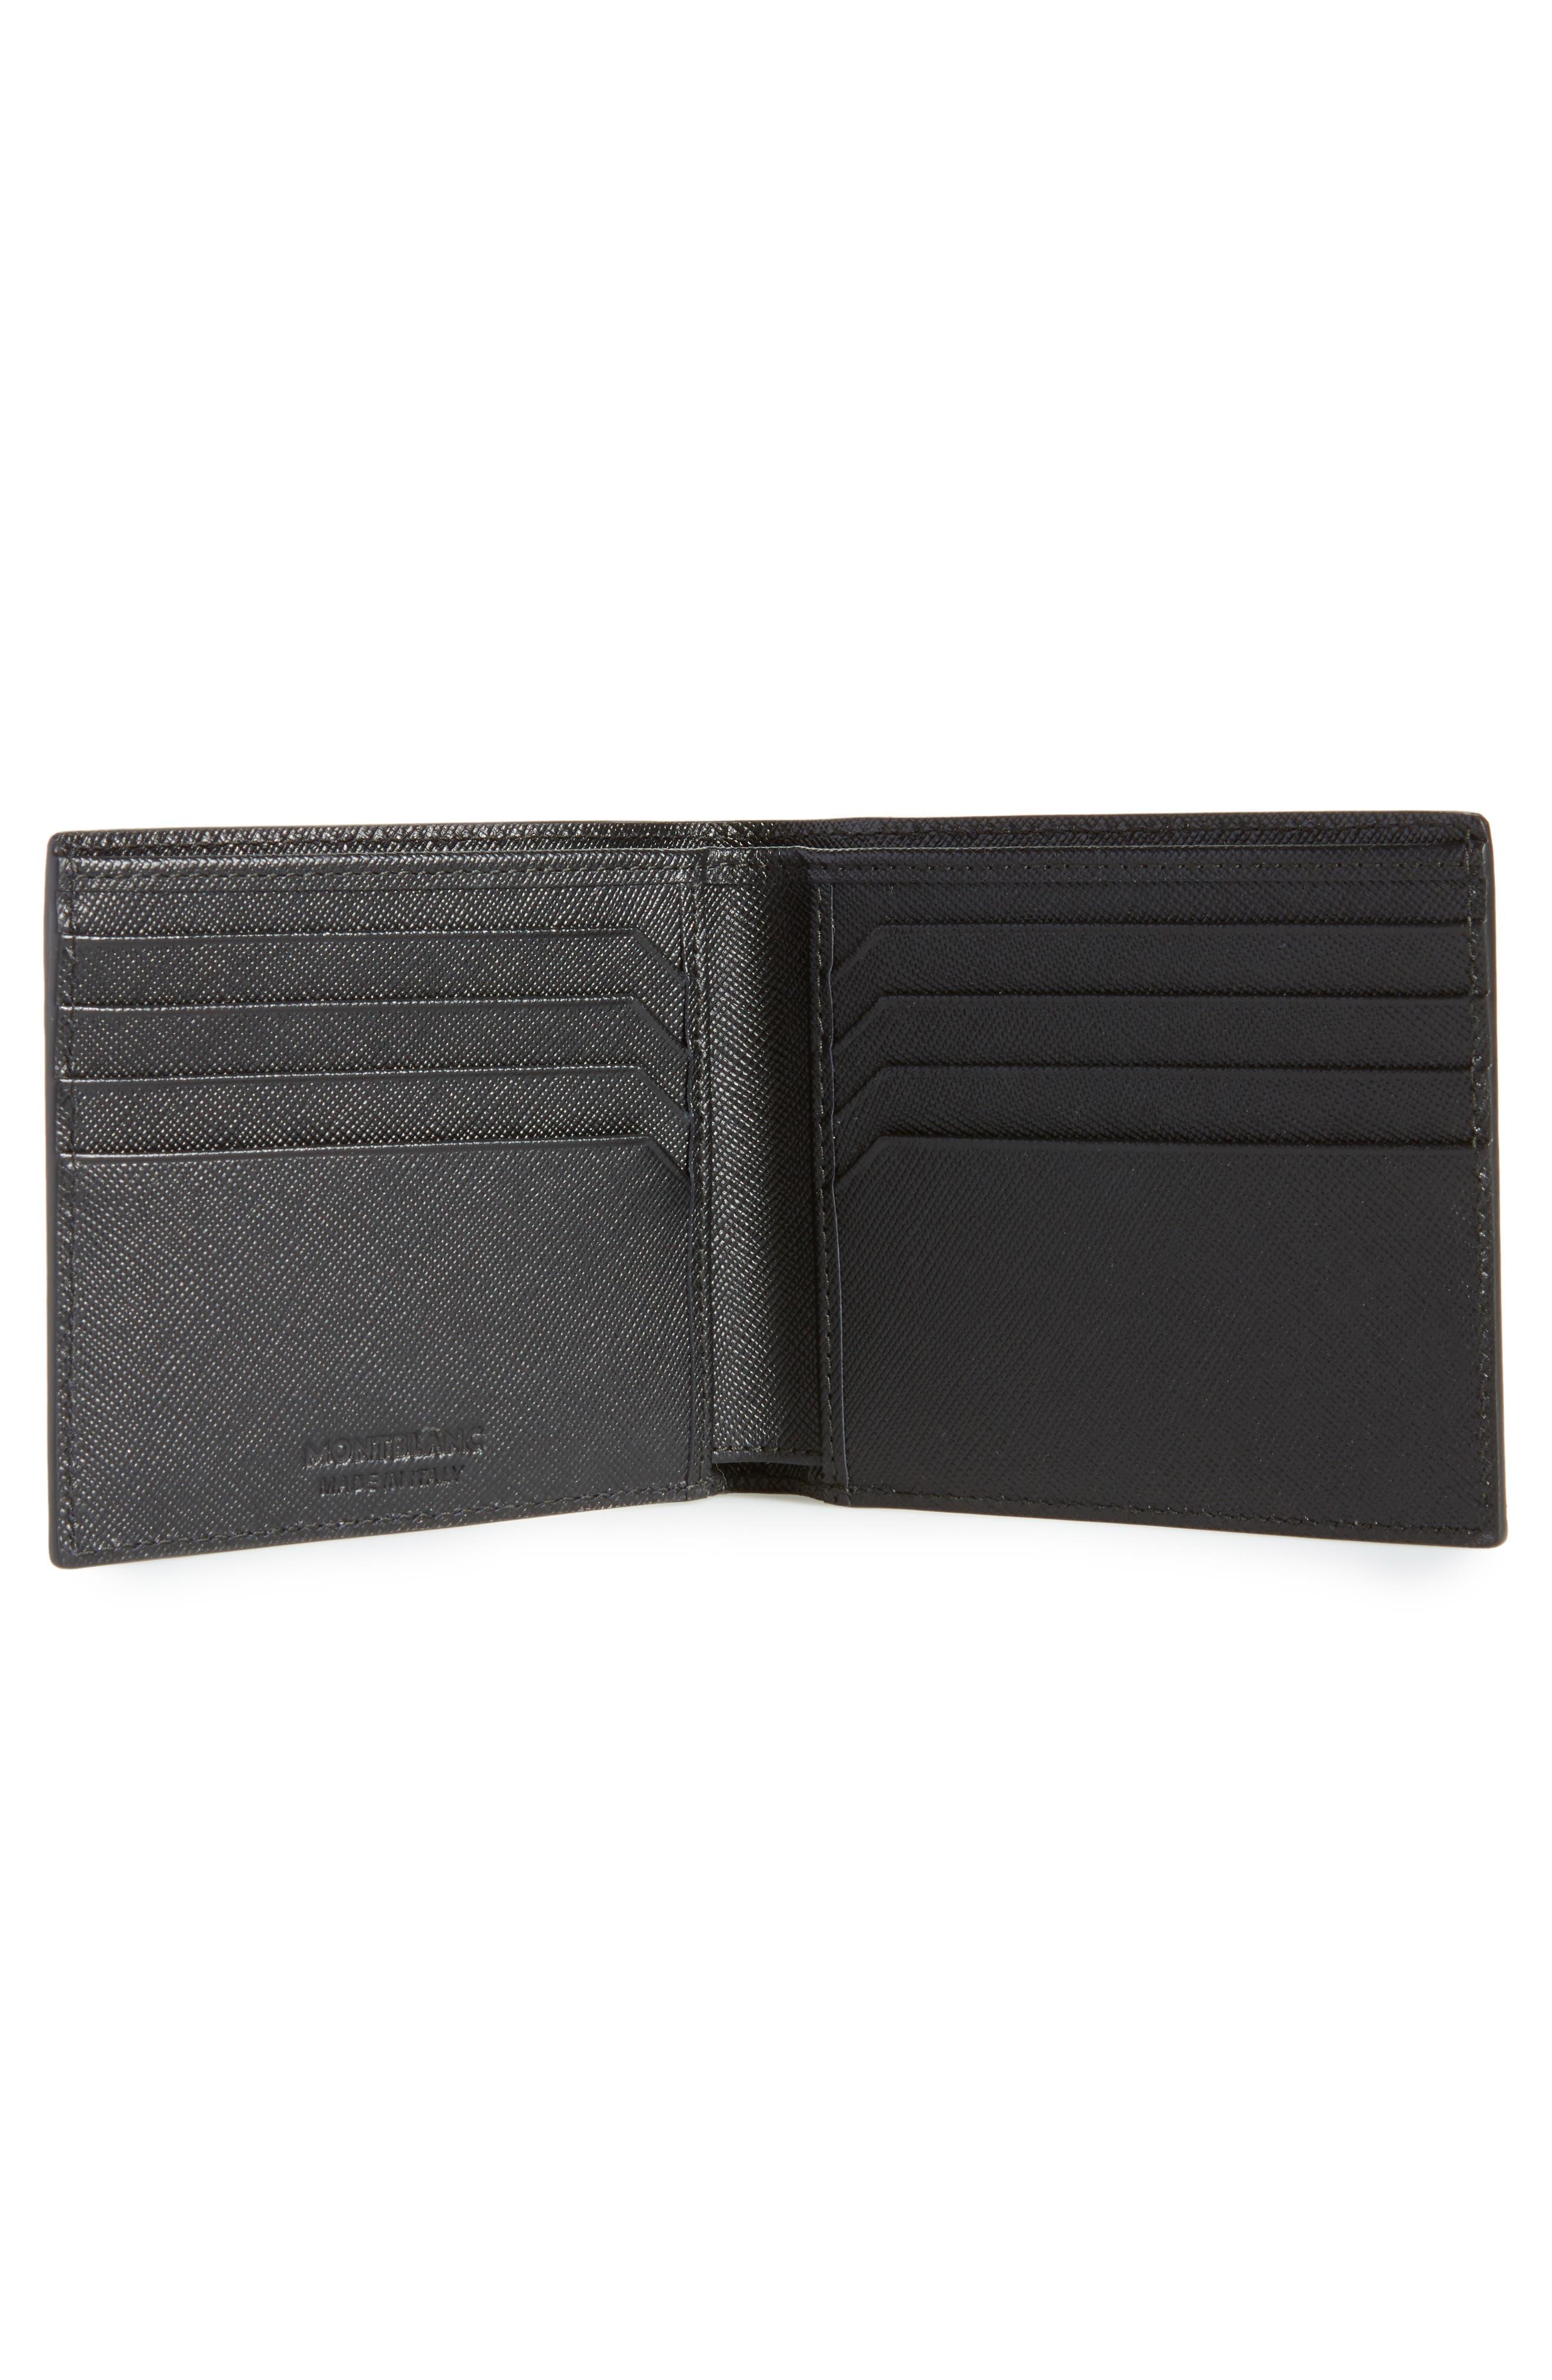 Sartorial Leather Wallet,                             Alternate thumbnail 2, color,                             BLACK